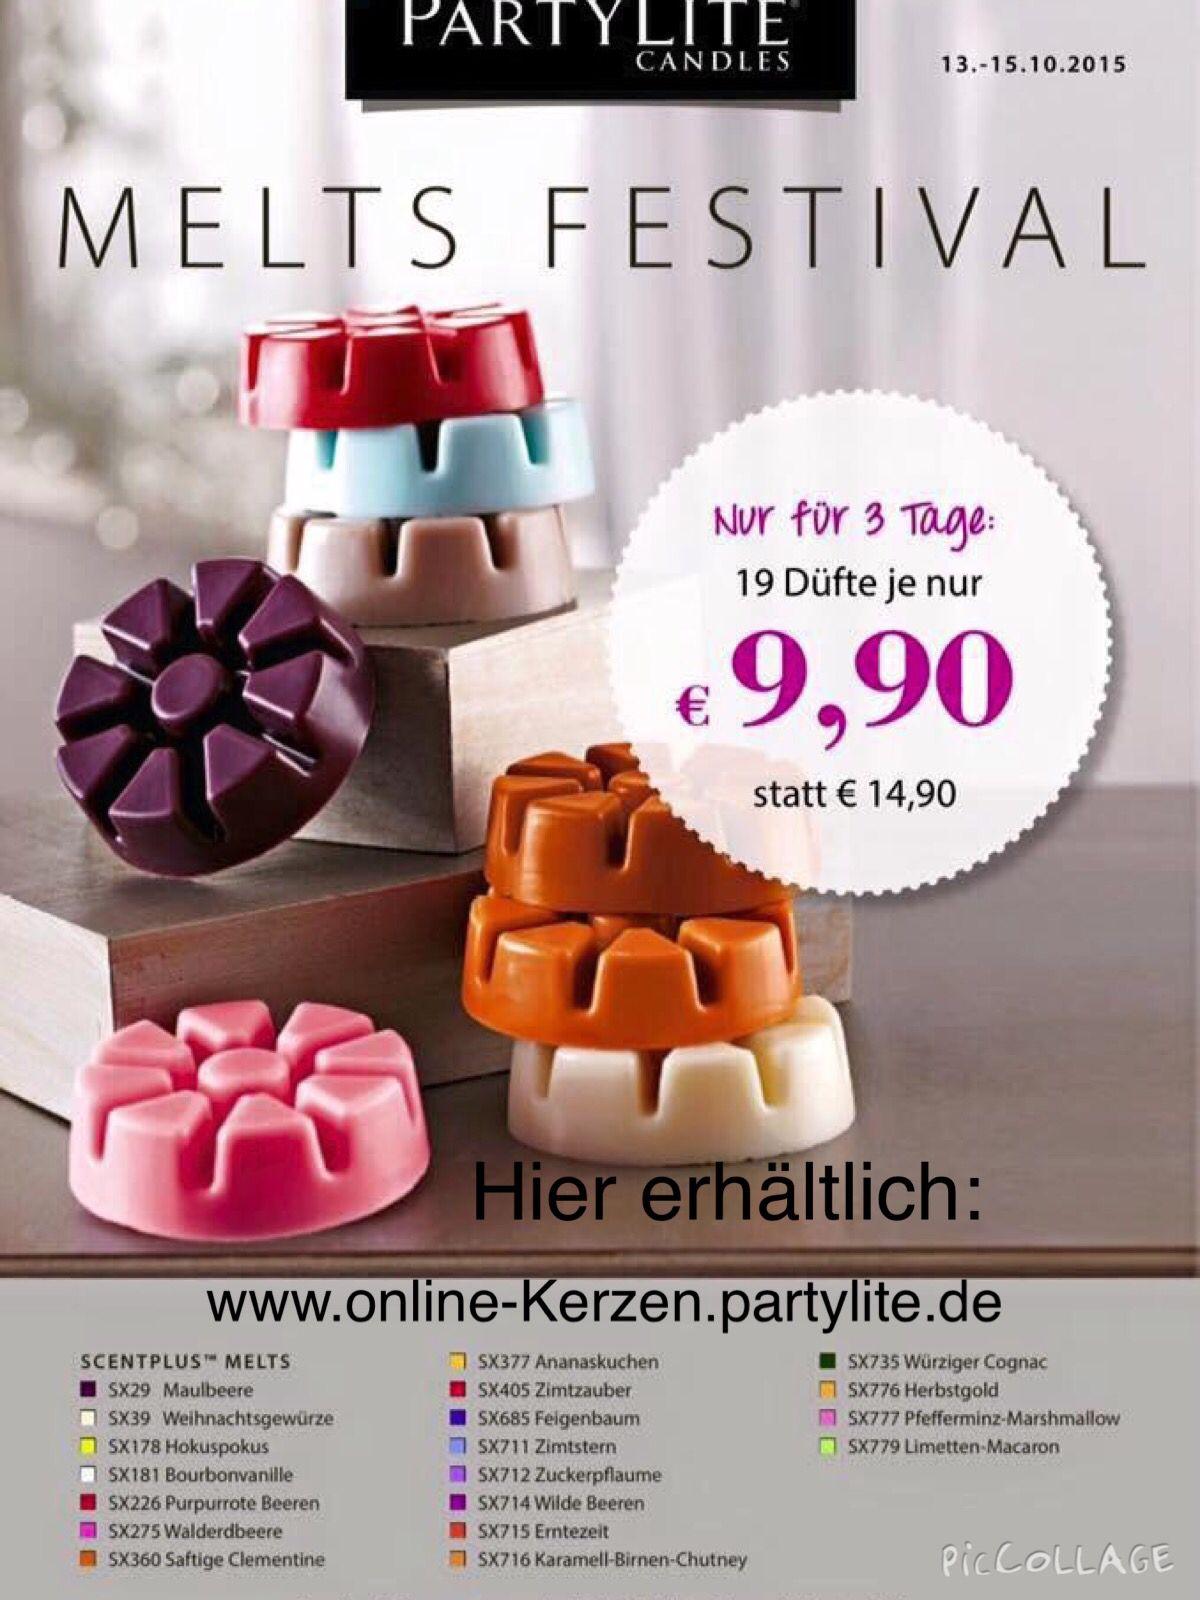 https://online-kerzen.partylite.de/Shop/Category/341 #partylite #angebote #melts #duftlampe #partylitemünchen